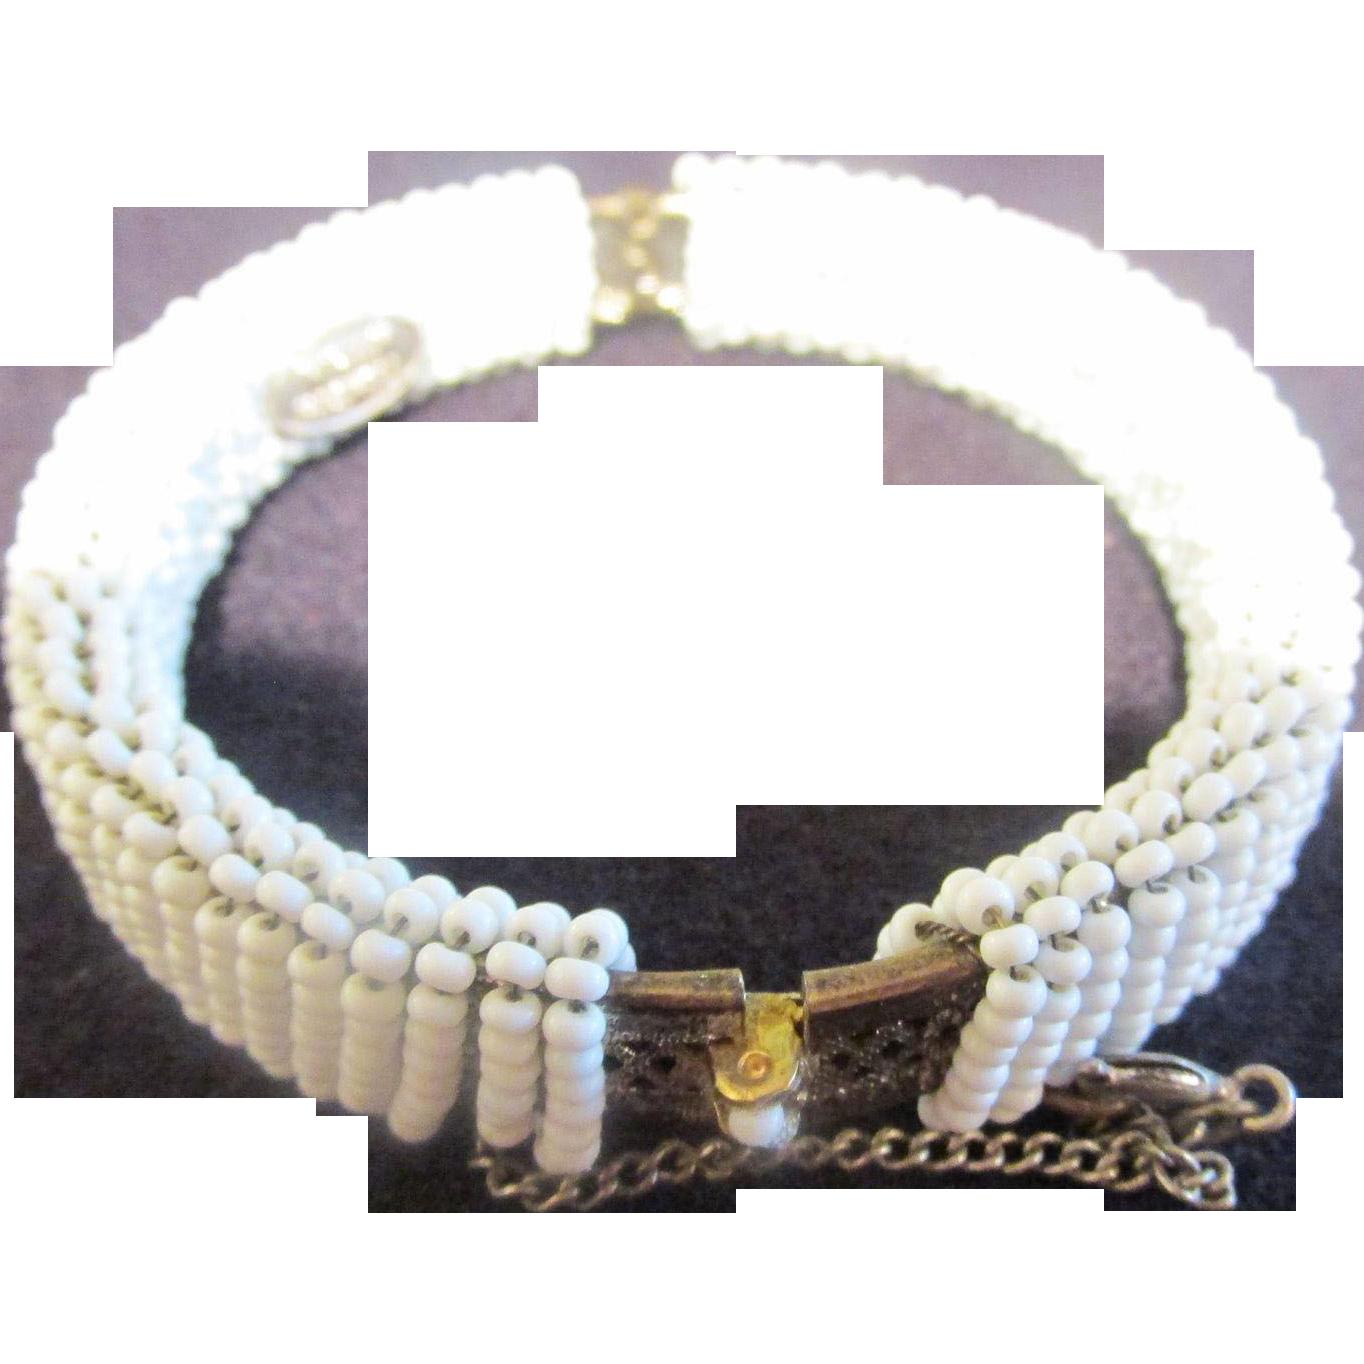 Miriam Haskell Tiny Seed Beaded Bracelet & Earrings